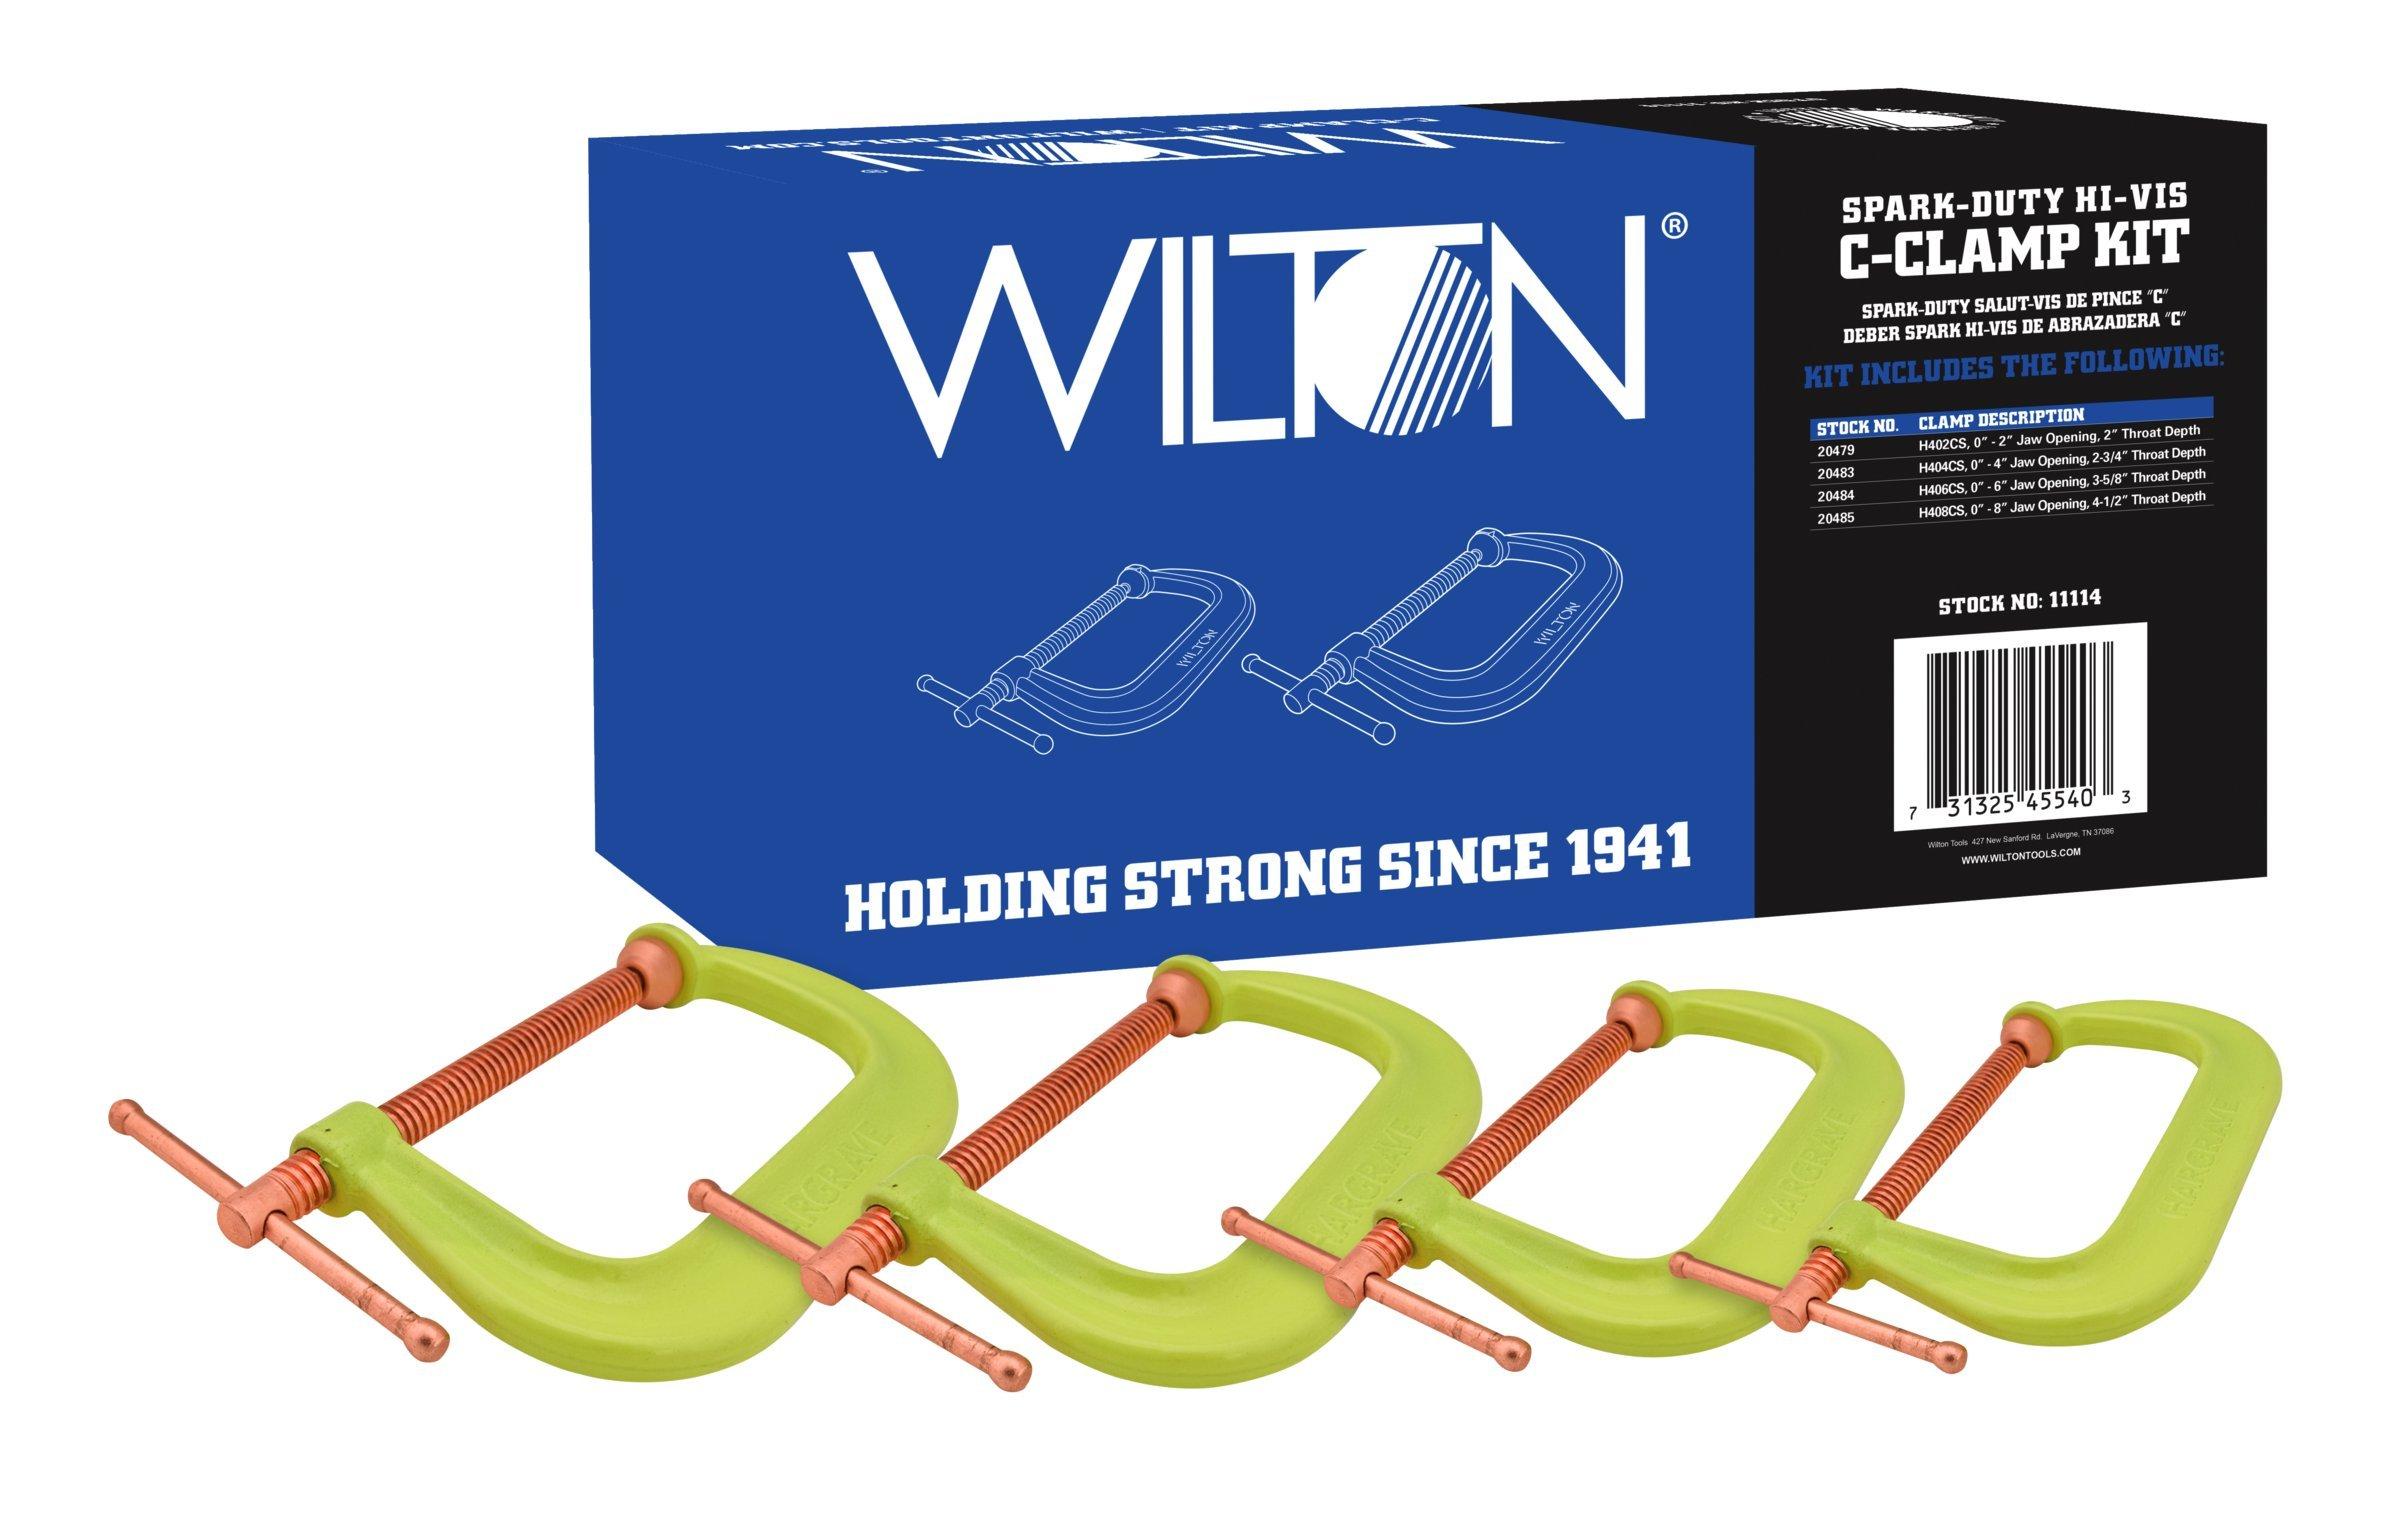 Wilton 11114 Spark-Duty 400CS Hi-Vis C-Clamp Kit by Wilton (Image #1)